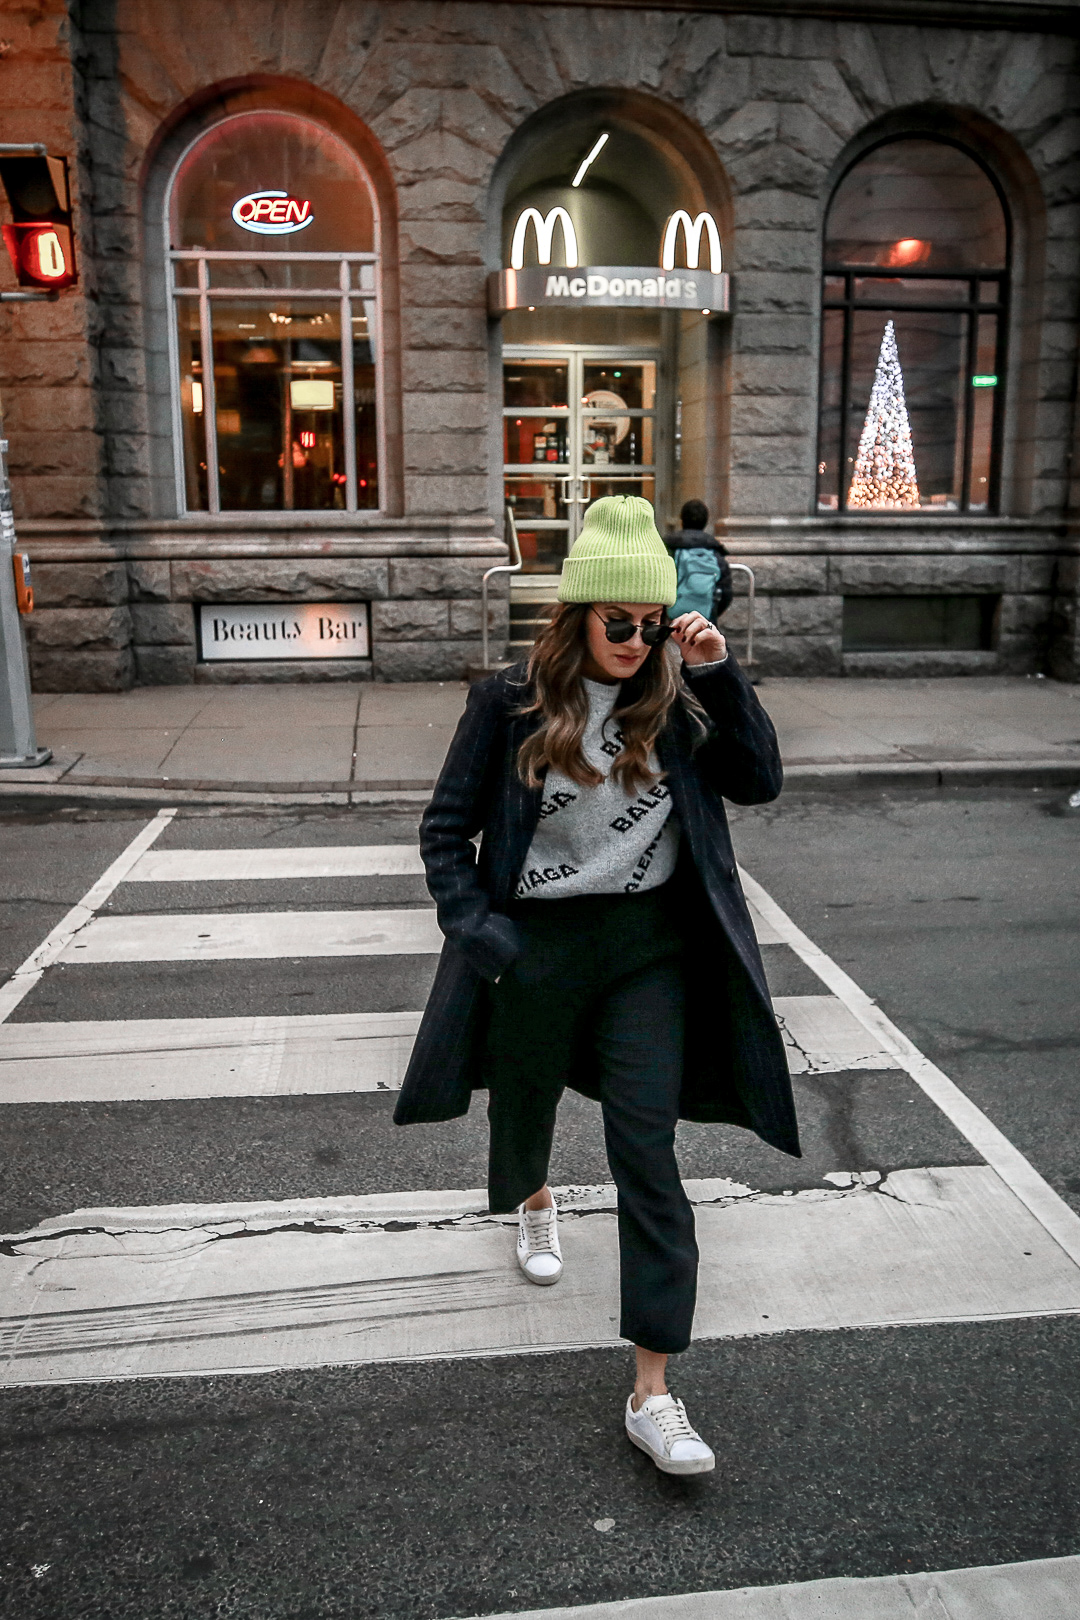 Nathalie Martin wearing Balenciaga logo sweater, Saint Laurent canvas sneakers, Aritzia pinstripe Stedman coat, and neon green beanie and Bonlook Way sunglasses, streetstyle, woahstyle.com_3907.jpg